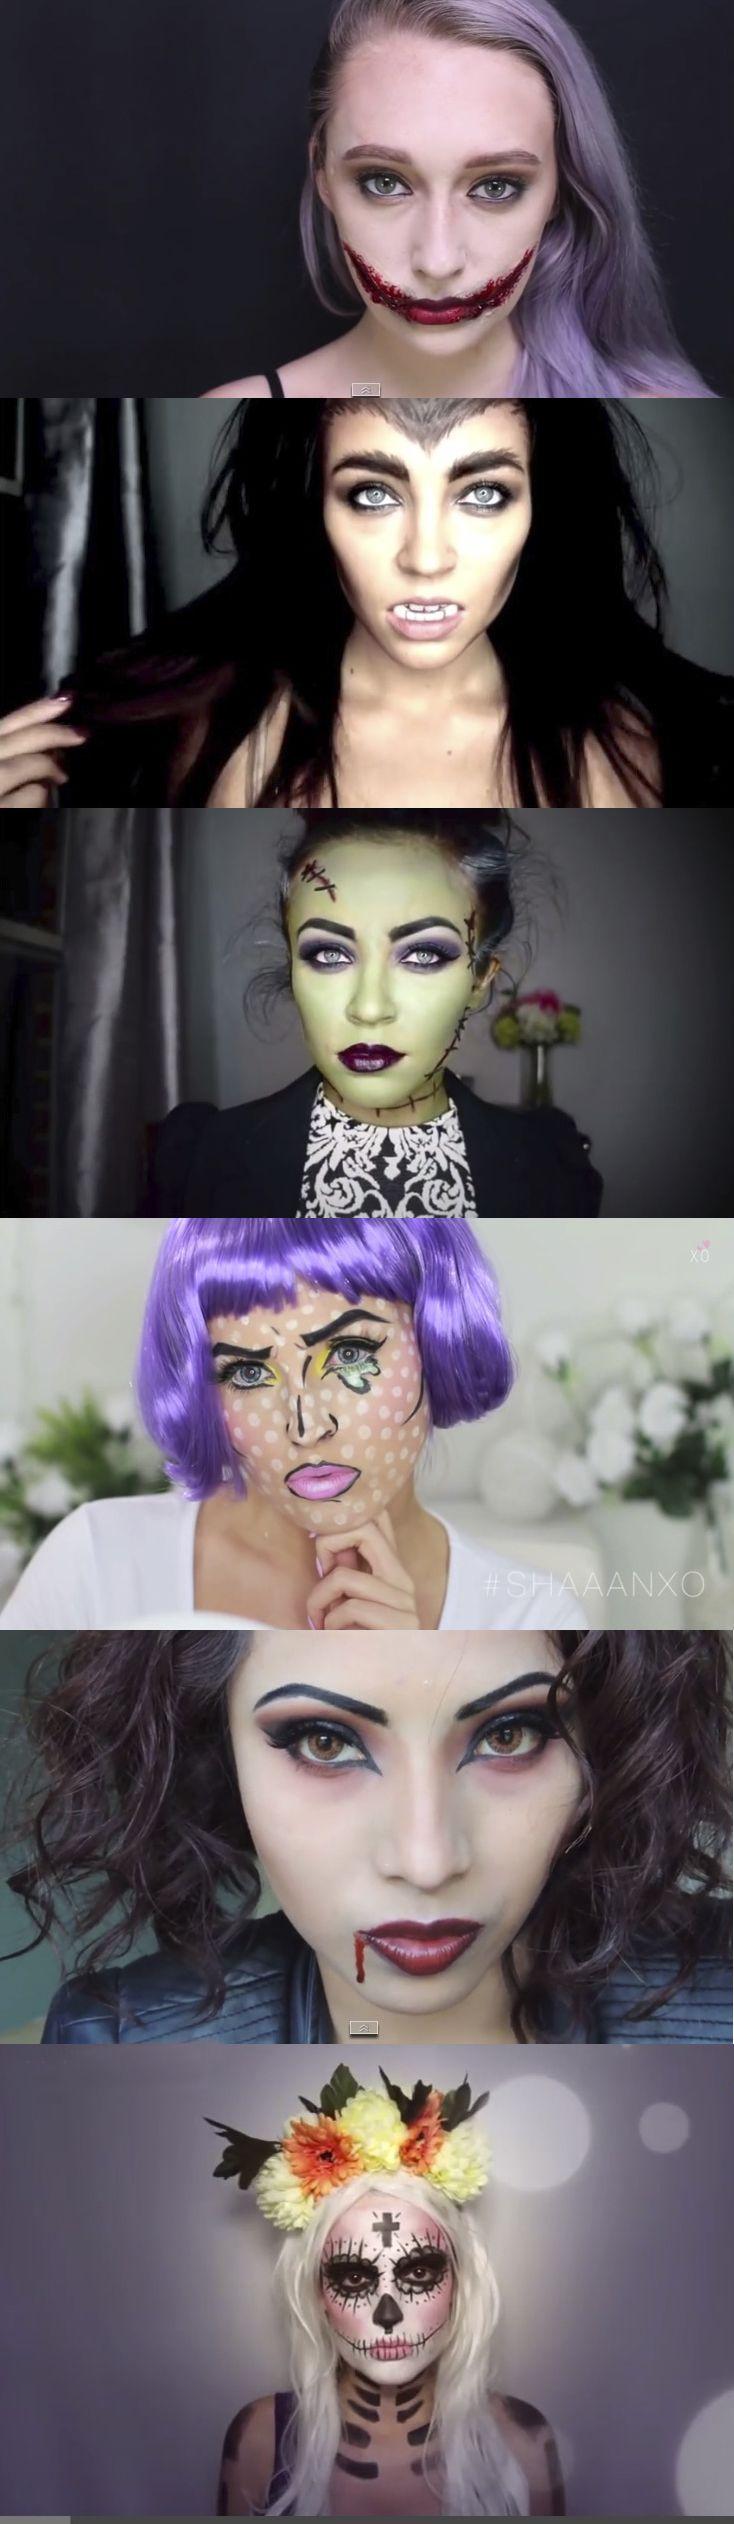 We've rounded up all the best halloween makeup tutorials on Youtube: http://www.cosmopolitan.co.uk/beauty-hair/makeup/news/a30265/cool-halloween-makeup-tutorials/